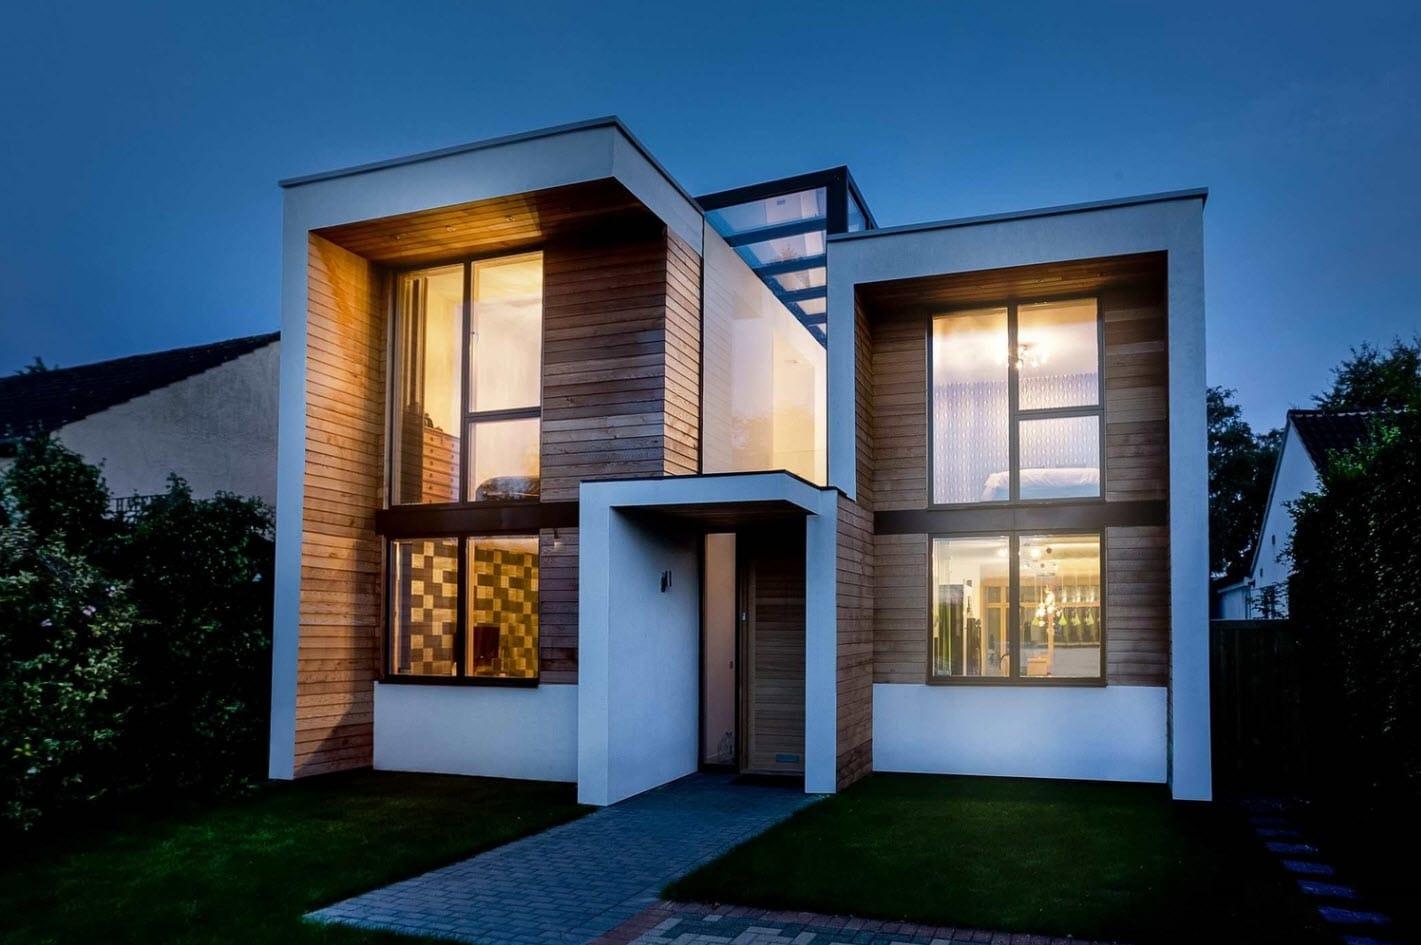 Dise o casa moderna de dos pisos for Oggettistica moderna per la casa